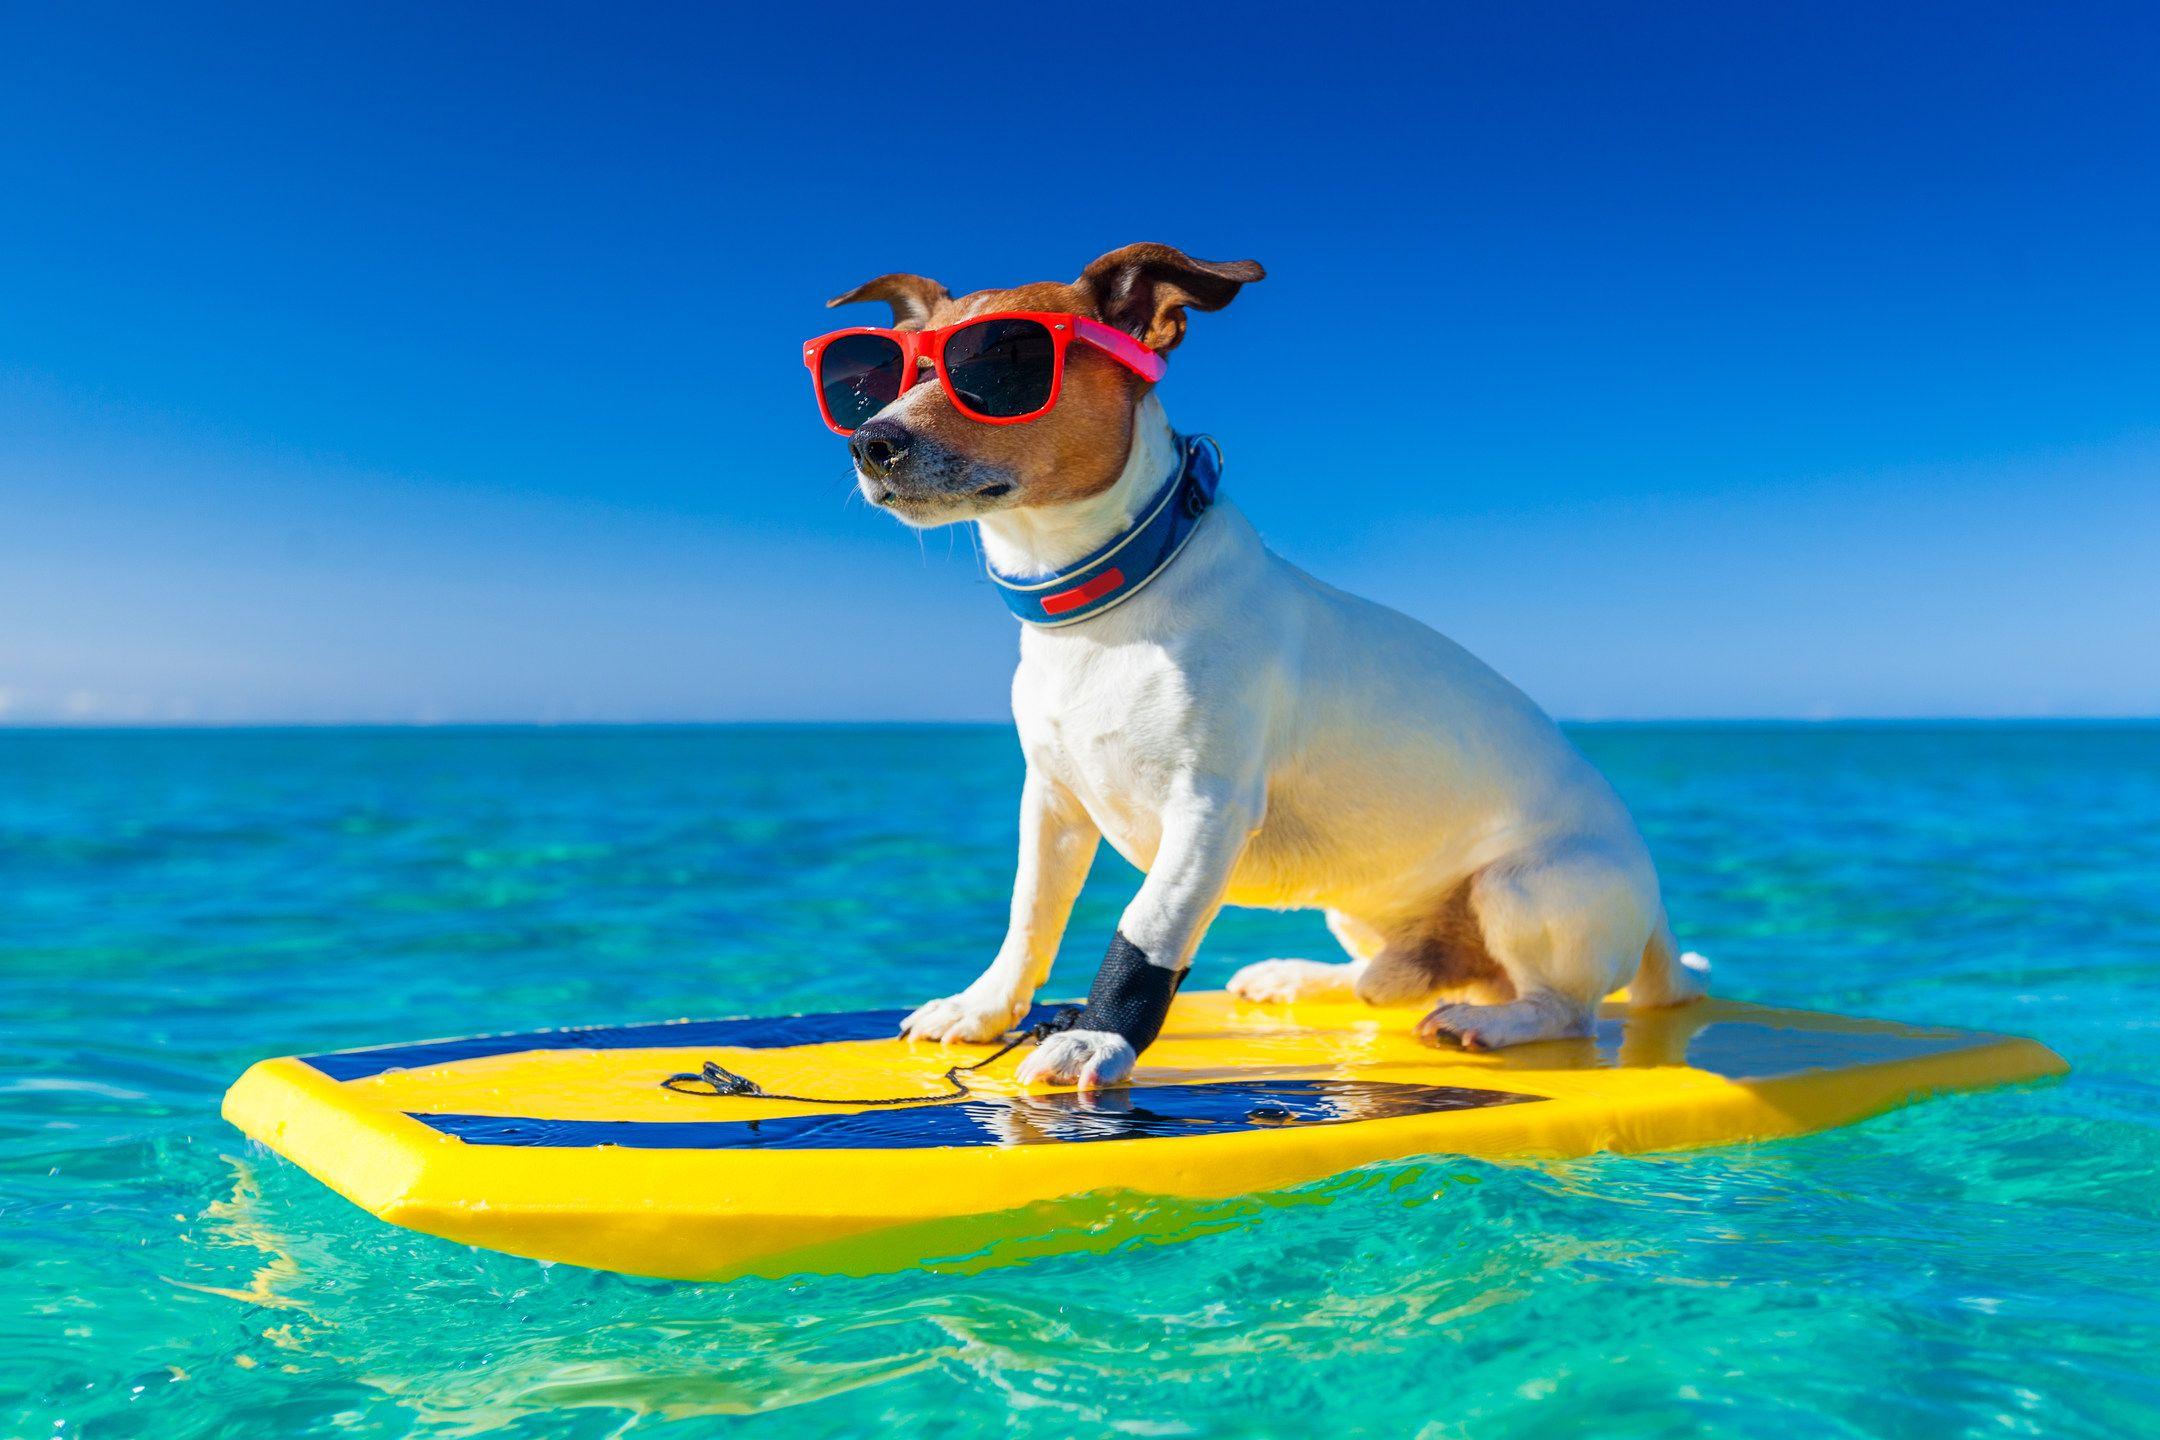 Surfing like a pro! Hawaiian dog names, Girl, dog, Dogs